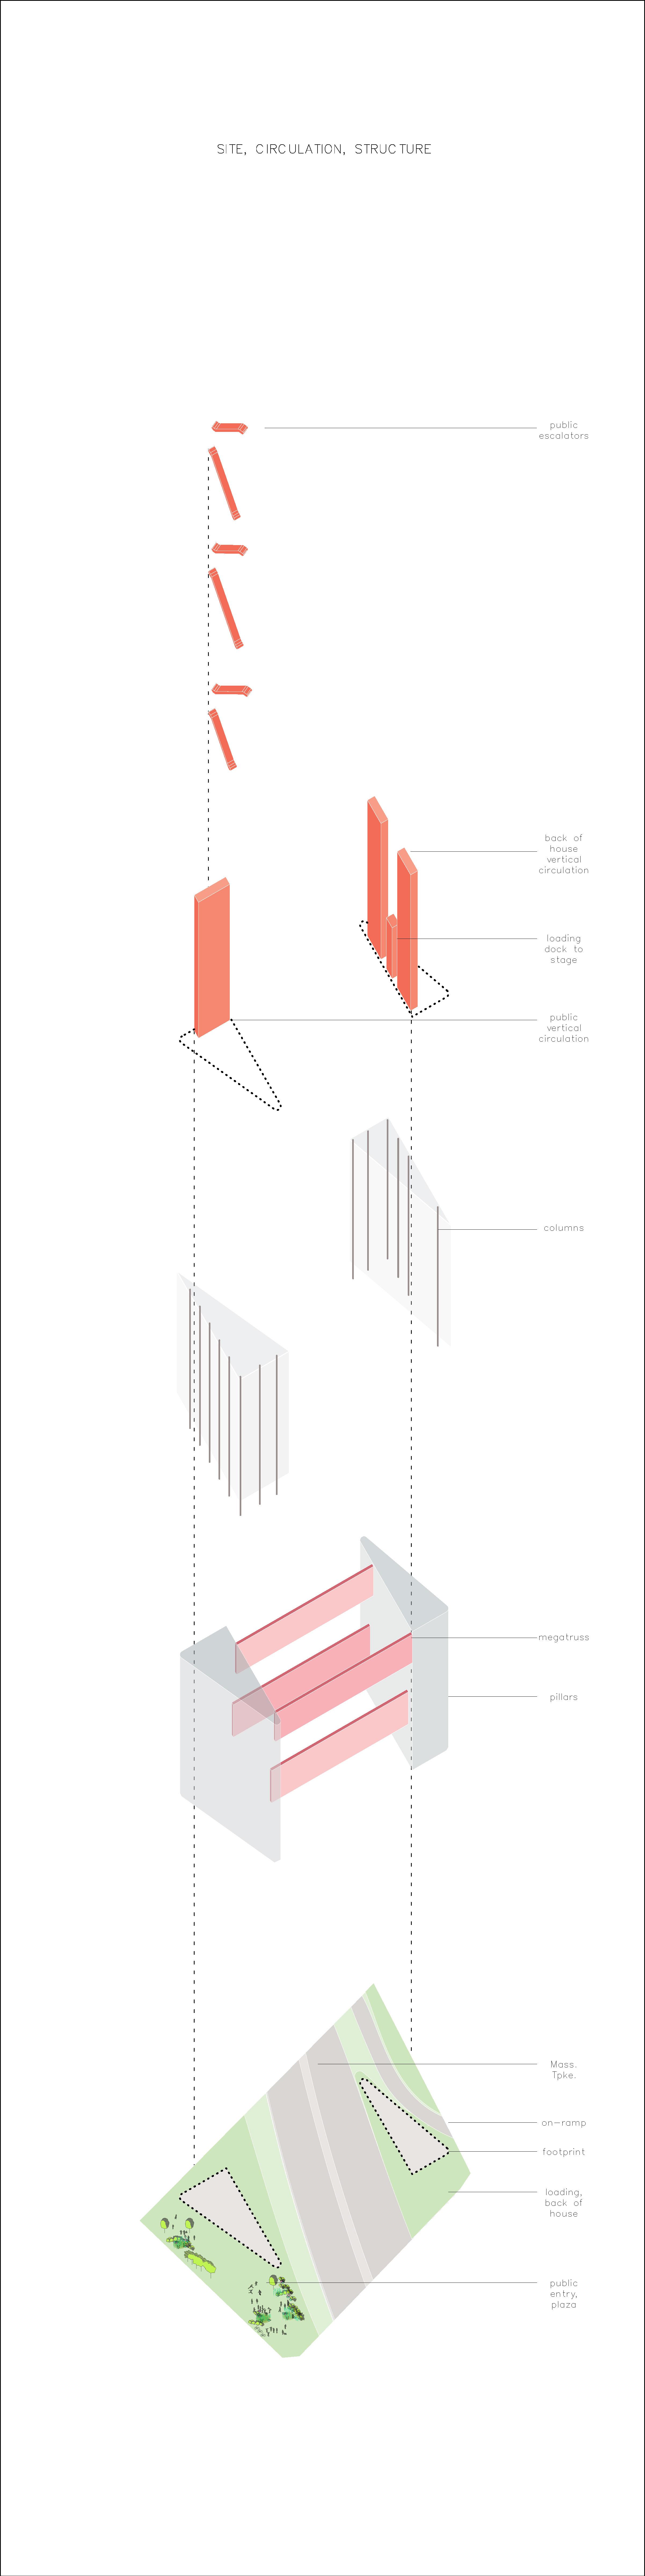 diagrams 1203_Page_4.jpg